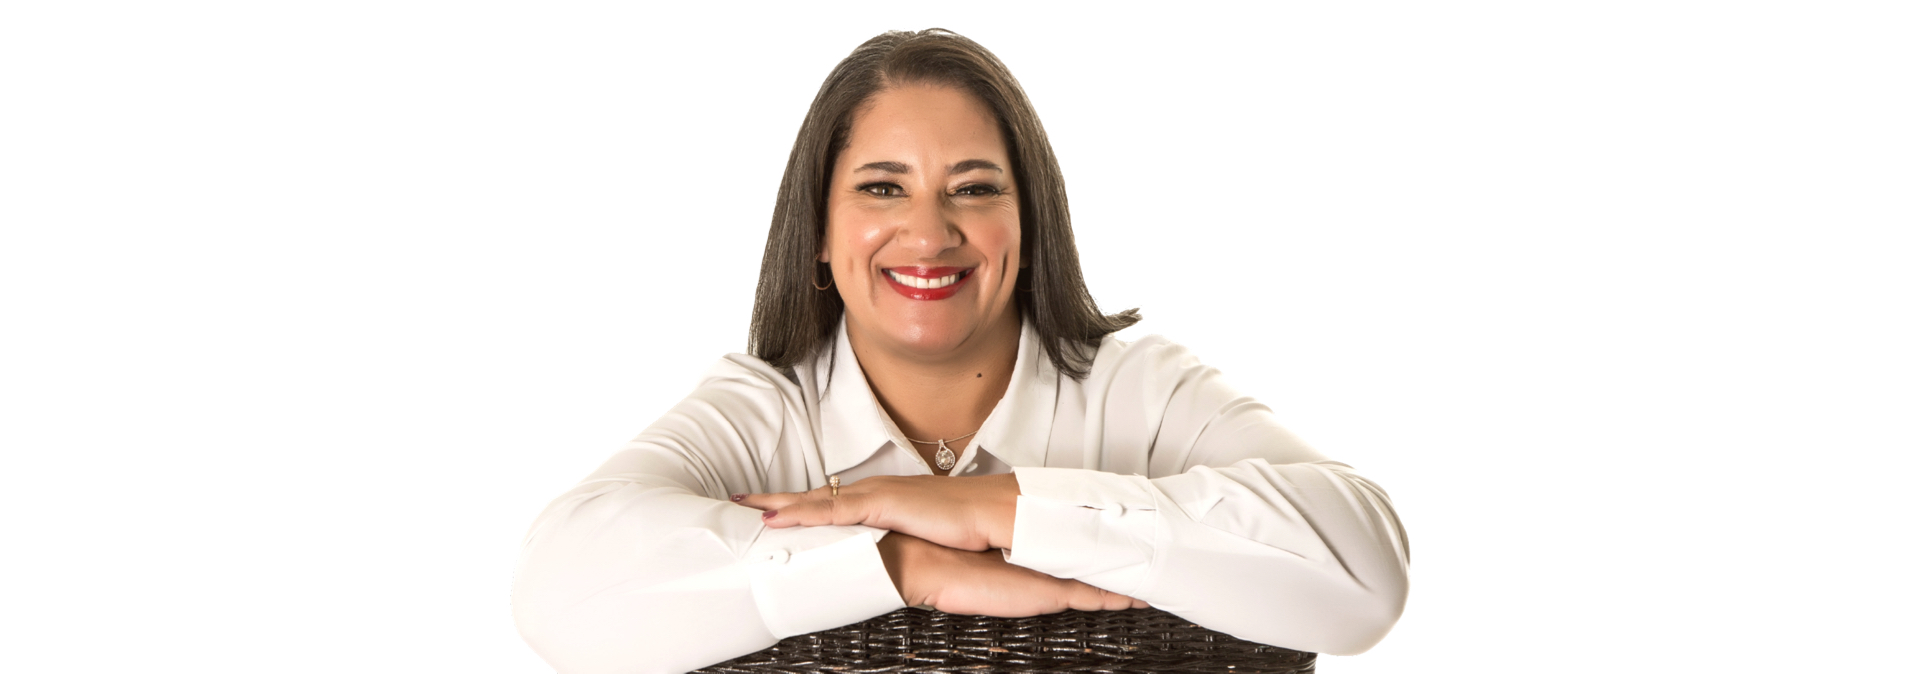 Lynn Kerchhoff - Author, Motivational Speaker